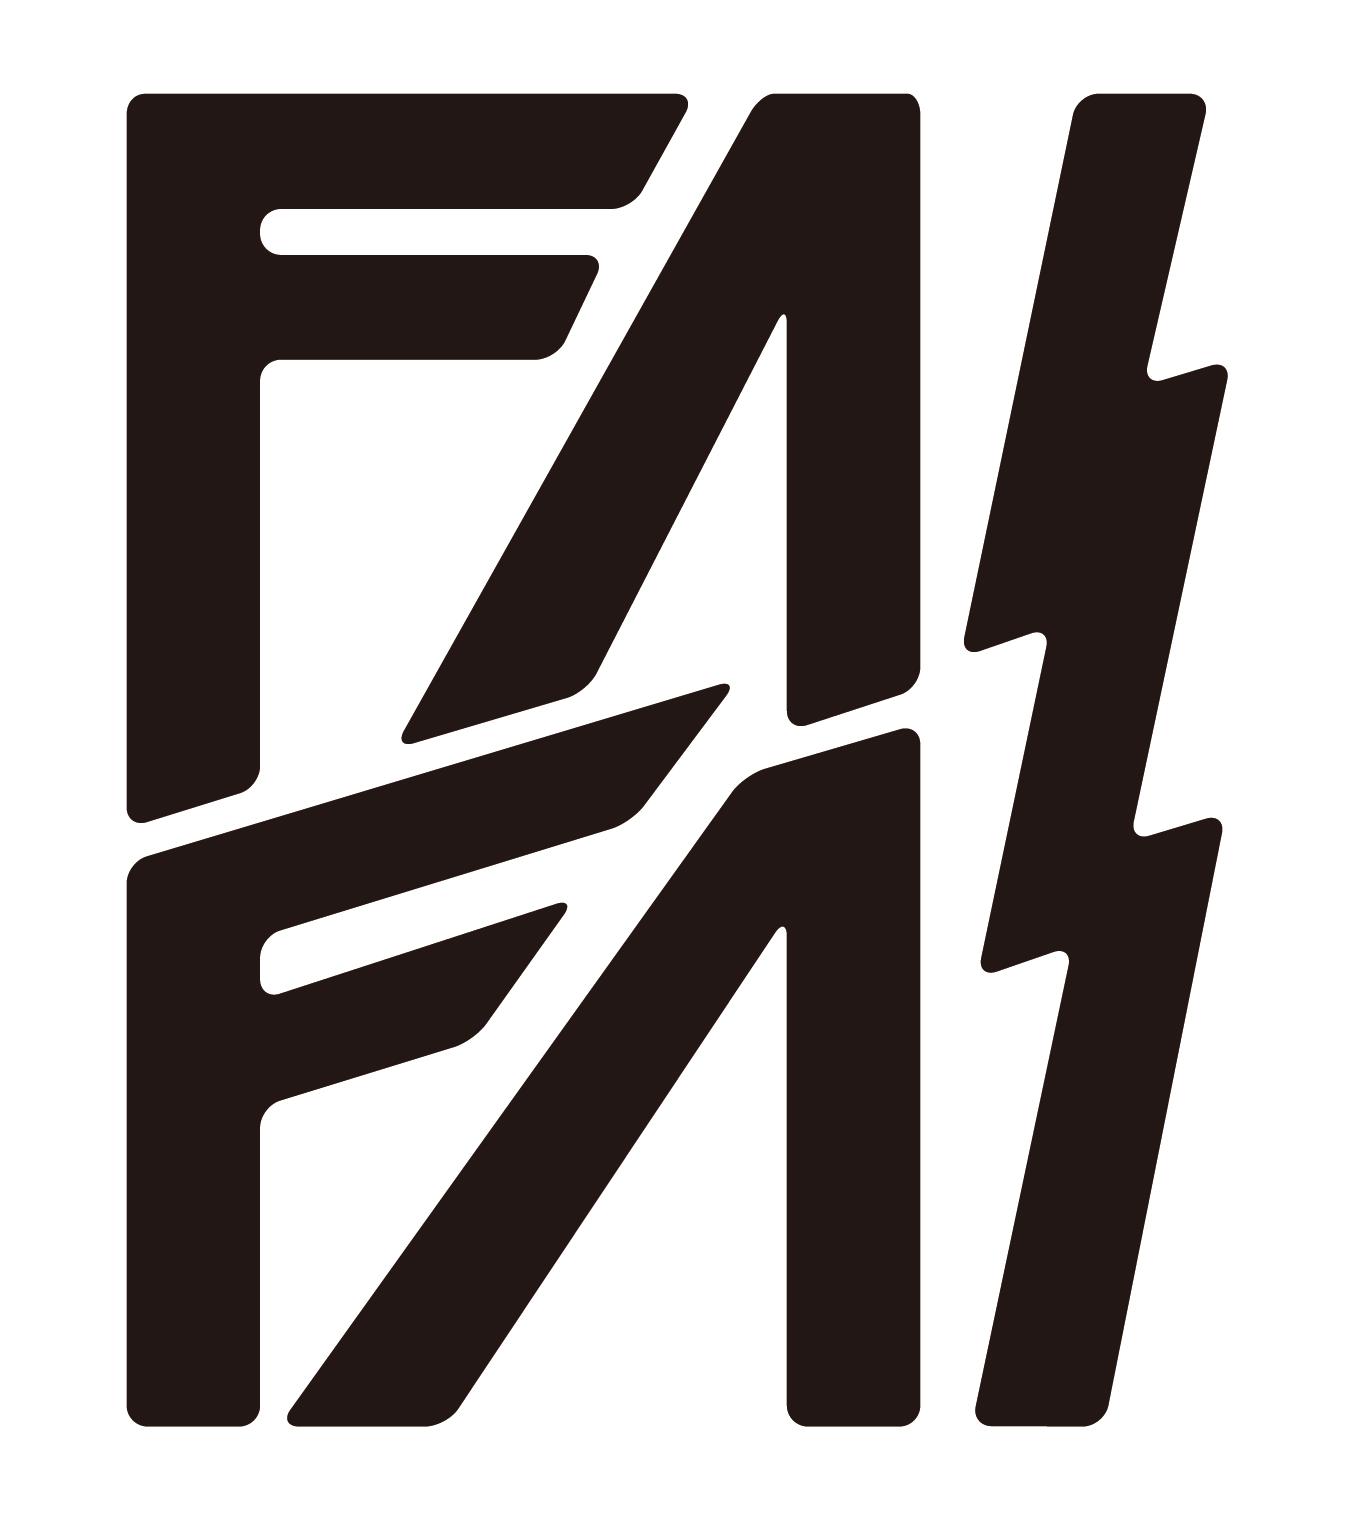 faifai_logo-big